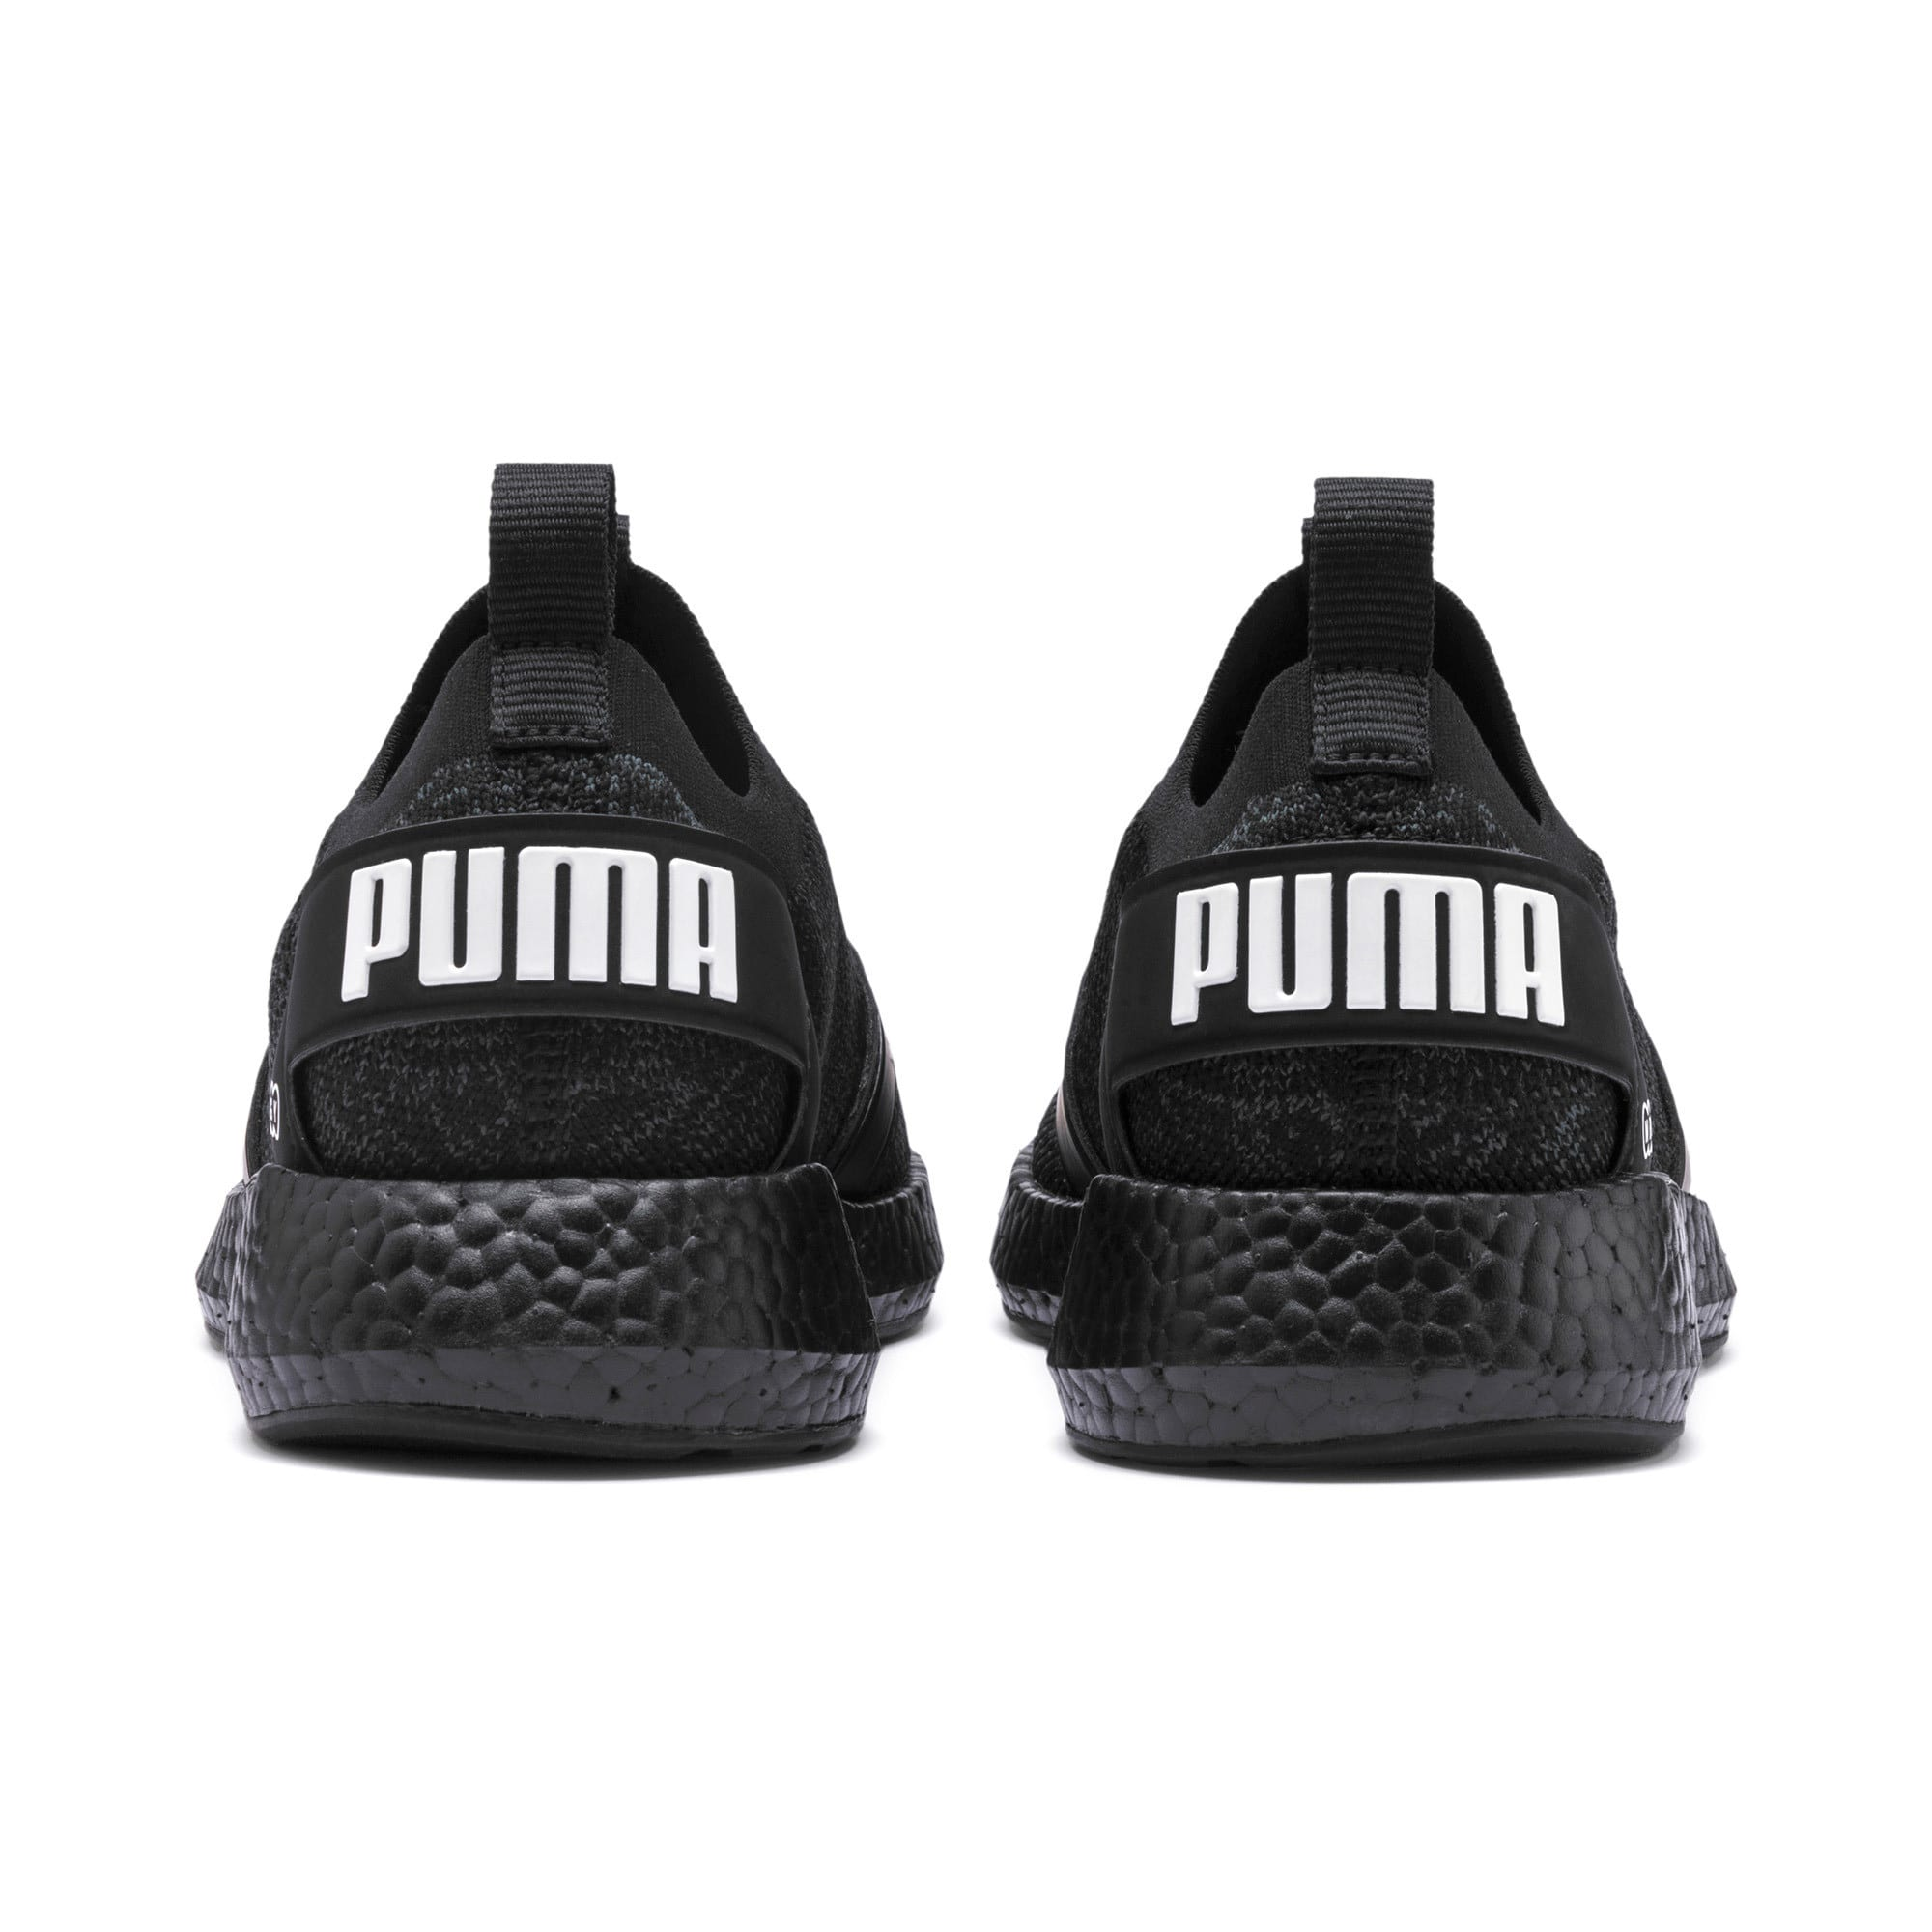 Thumbnail 4 of NRGY Neko Engineer Knit Women's Running Shoes, Puma Black-Puma Black, medium